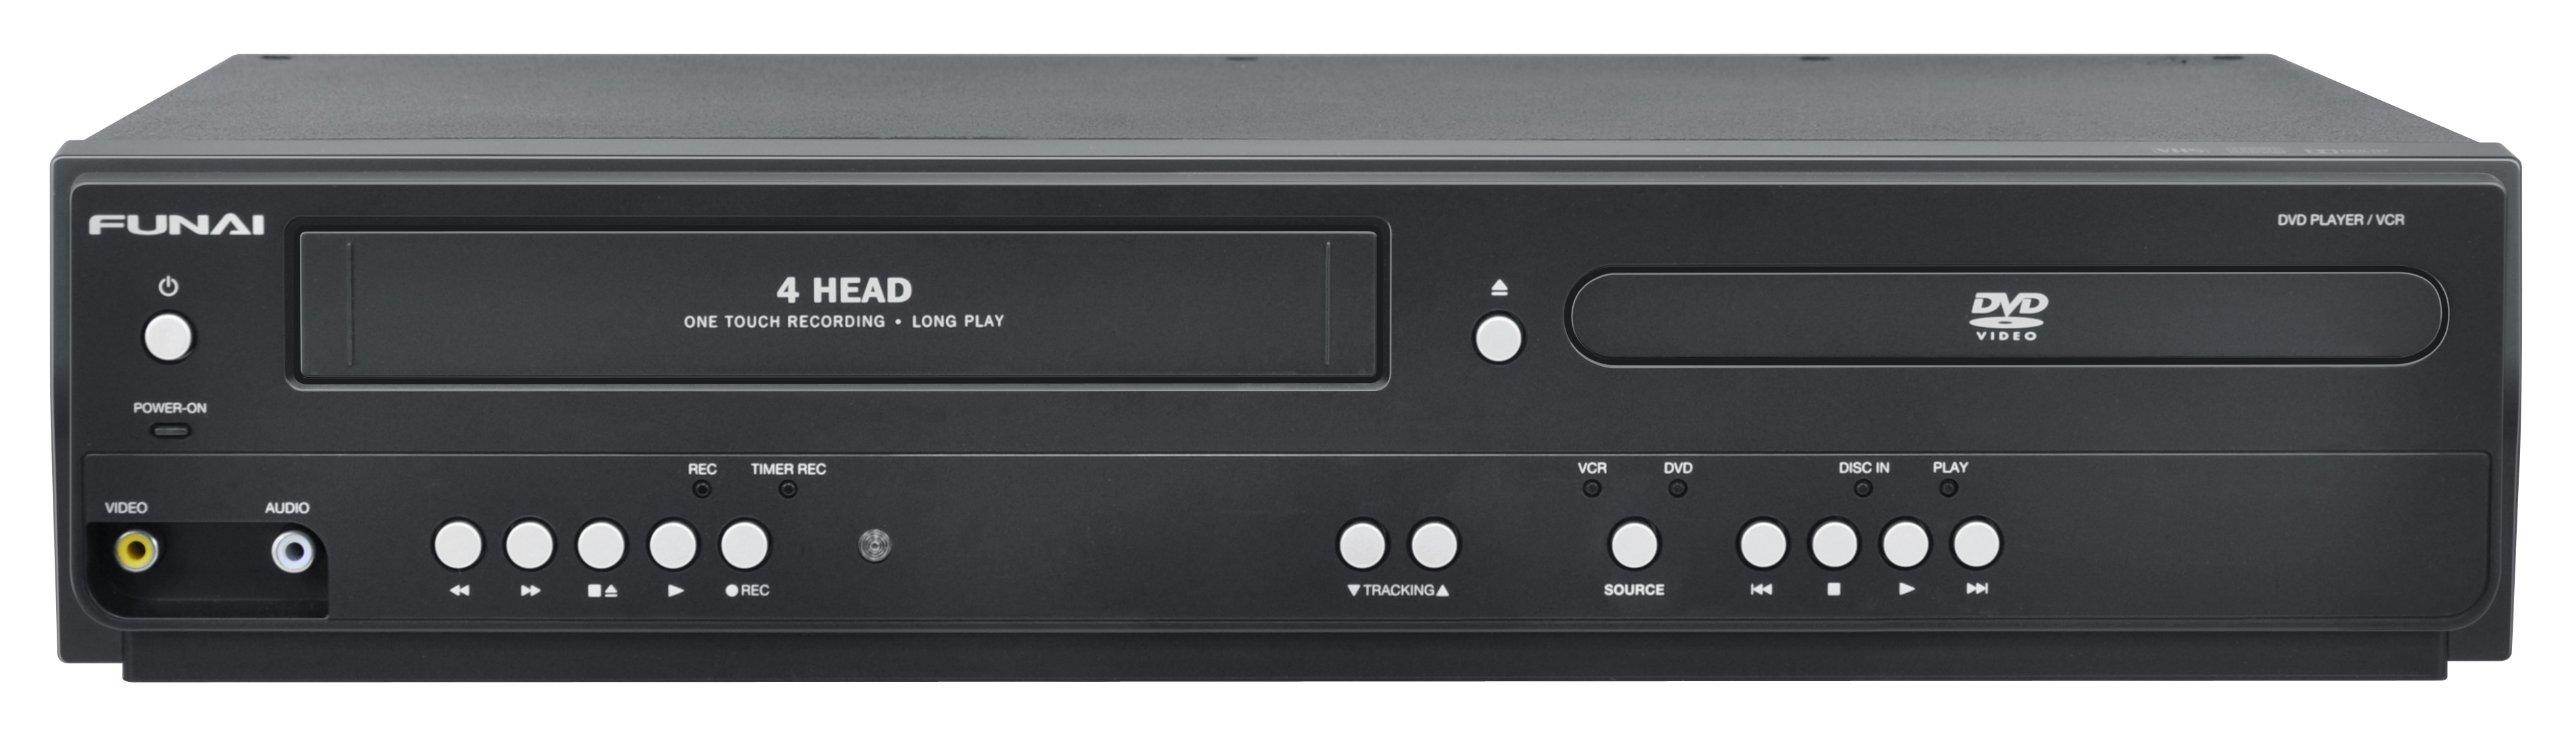 Funai Corp. DV220FX5 Dual Deck DVD and VHS Player by Funai